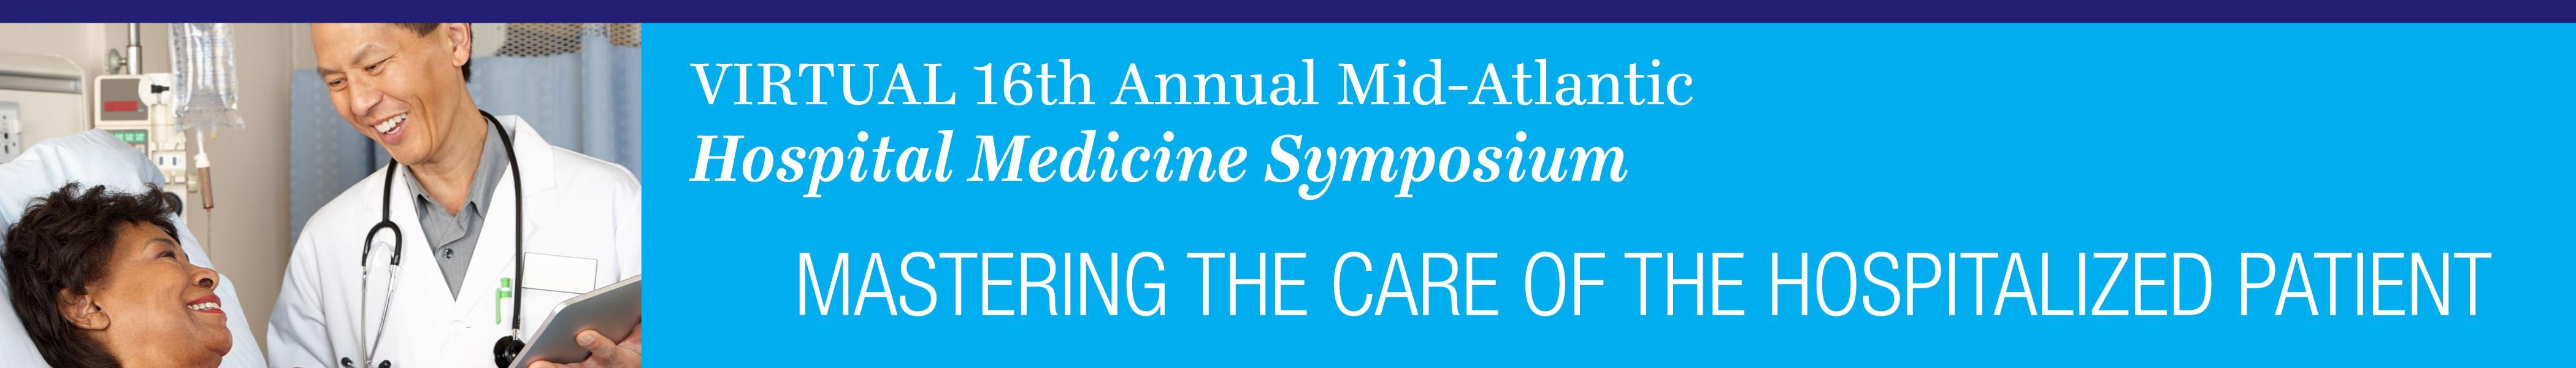 16th Annual Mid-Atlantic Hospital Medicine Symposium-Virtual Banner